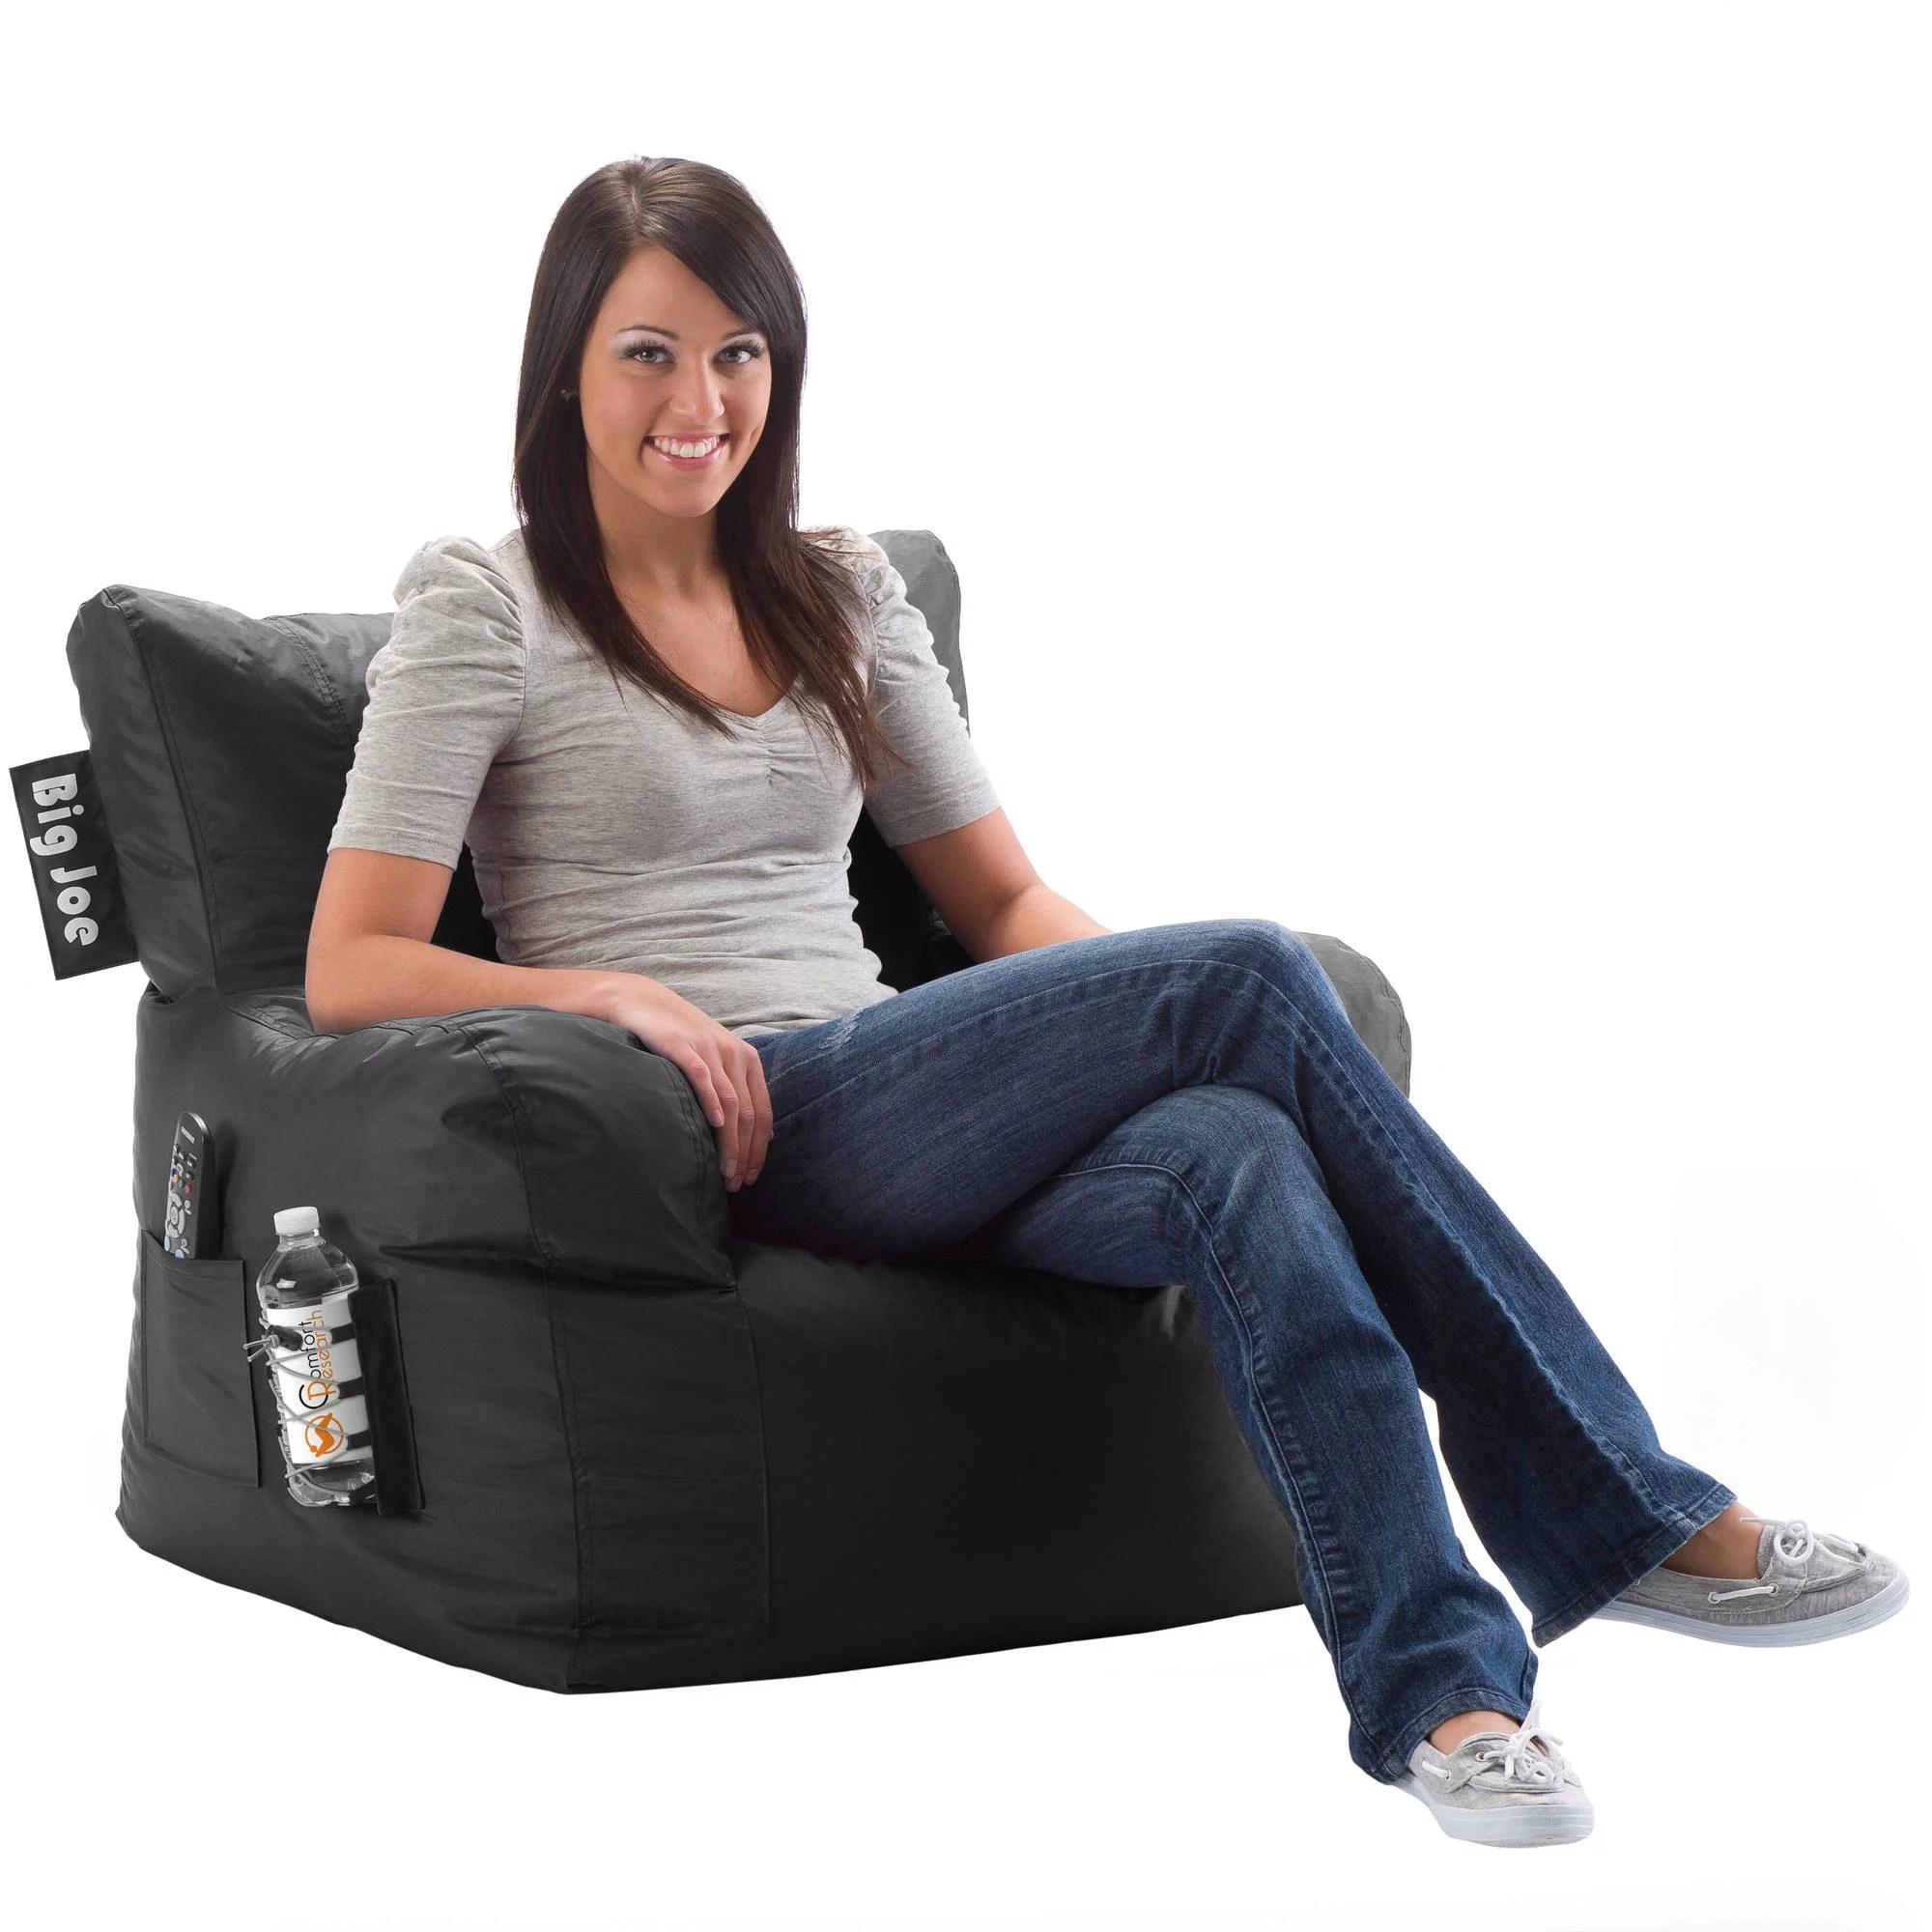 Big Joe Bean Bag Chair Multiple Colors Black  eBay